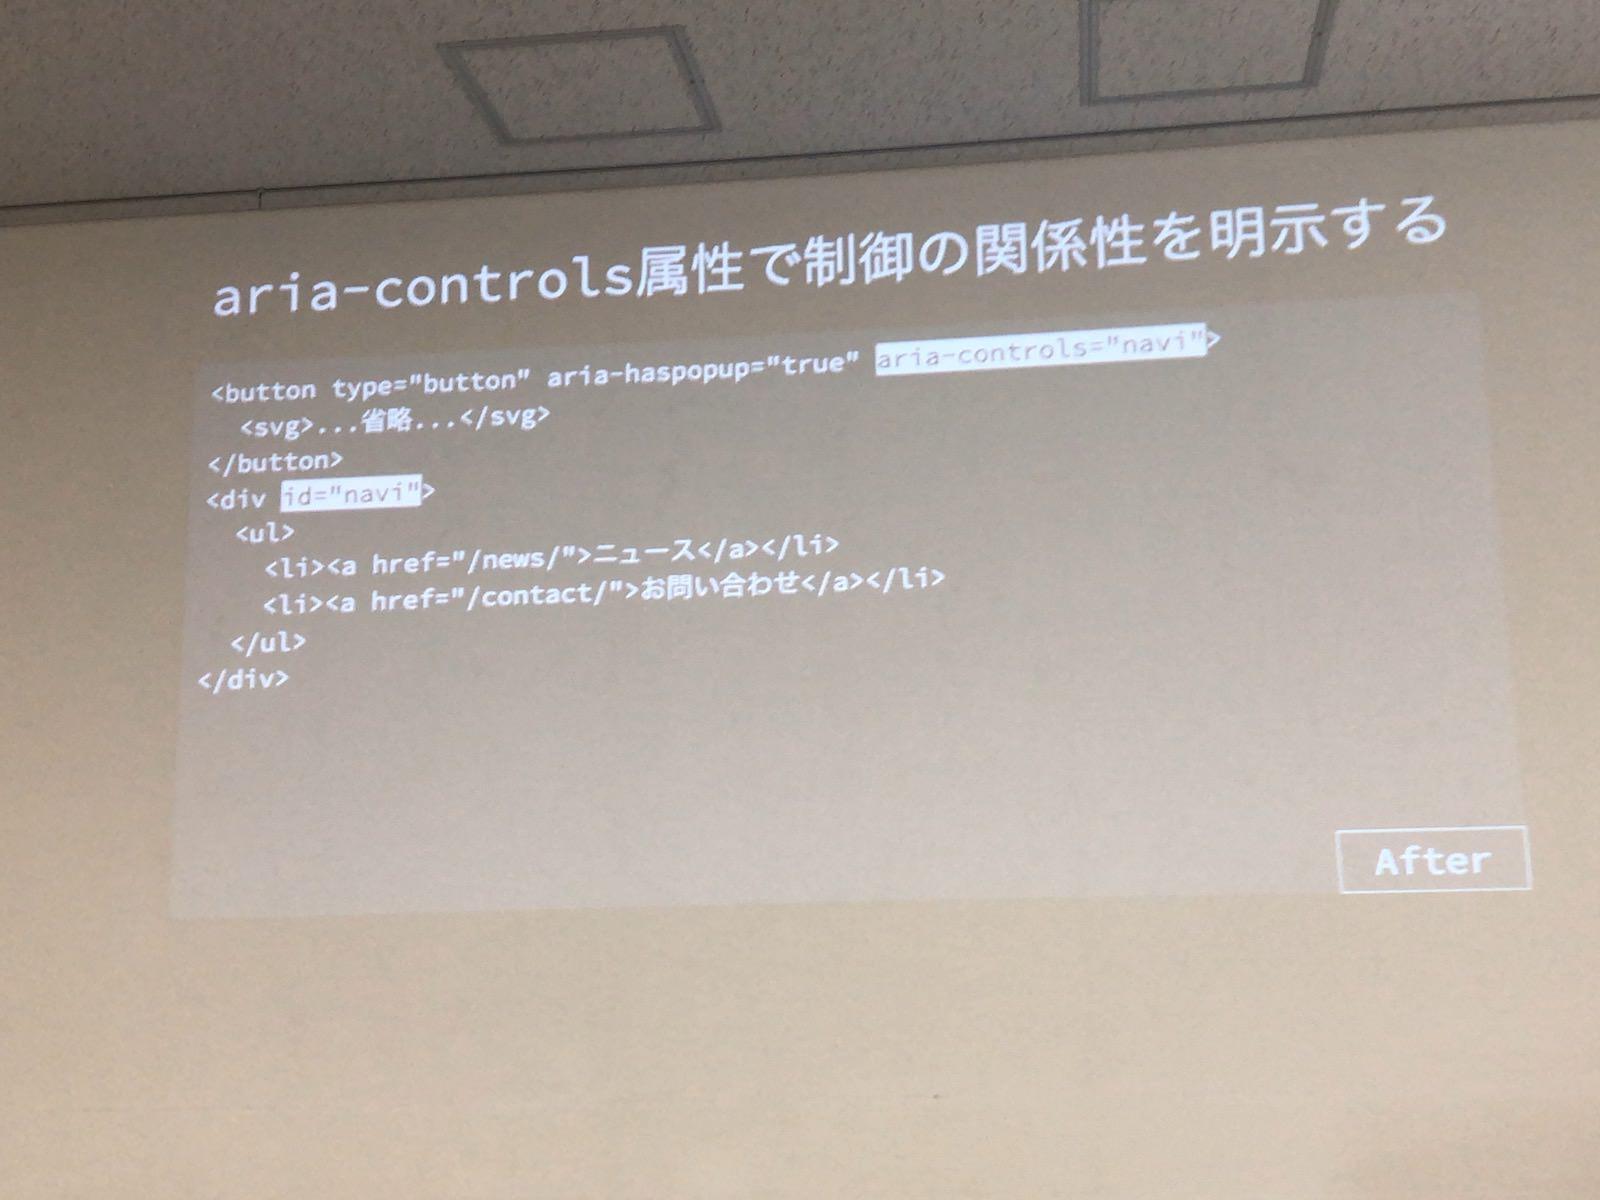 aria-controls属性を使用したマークアップ例